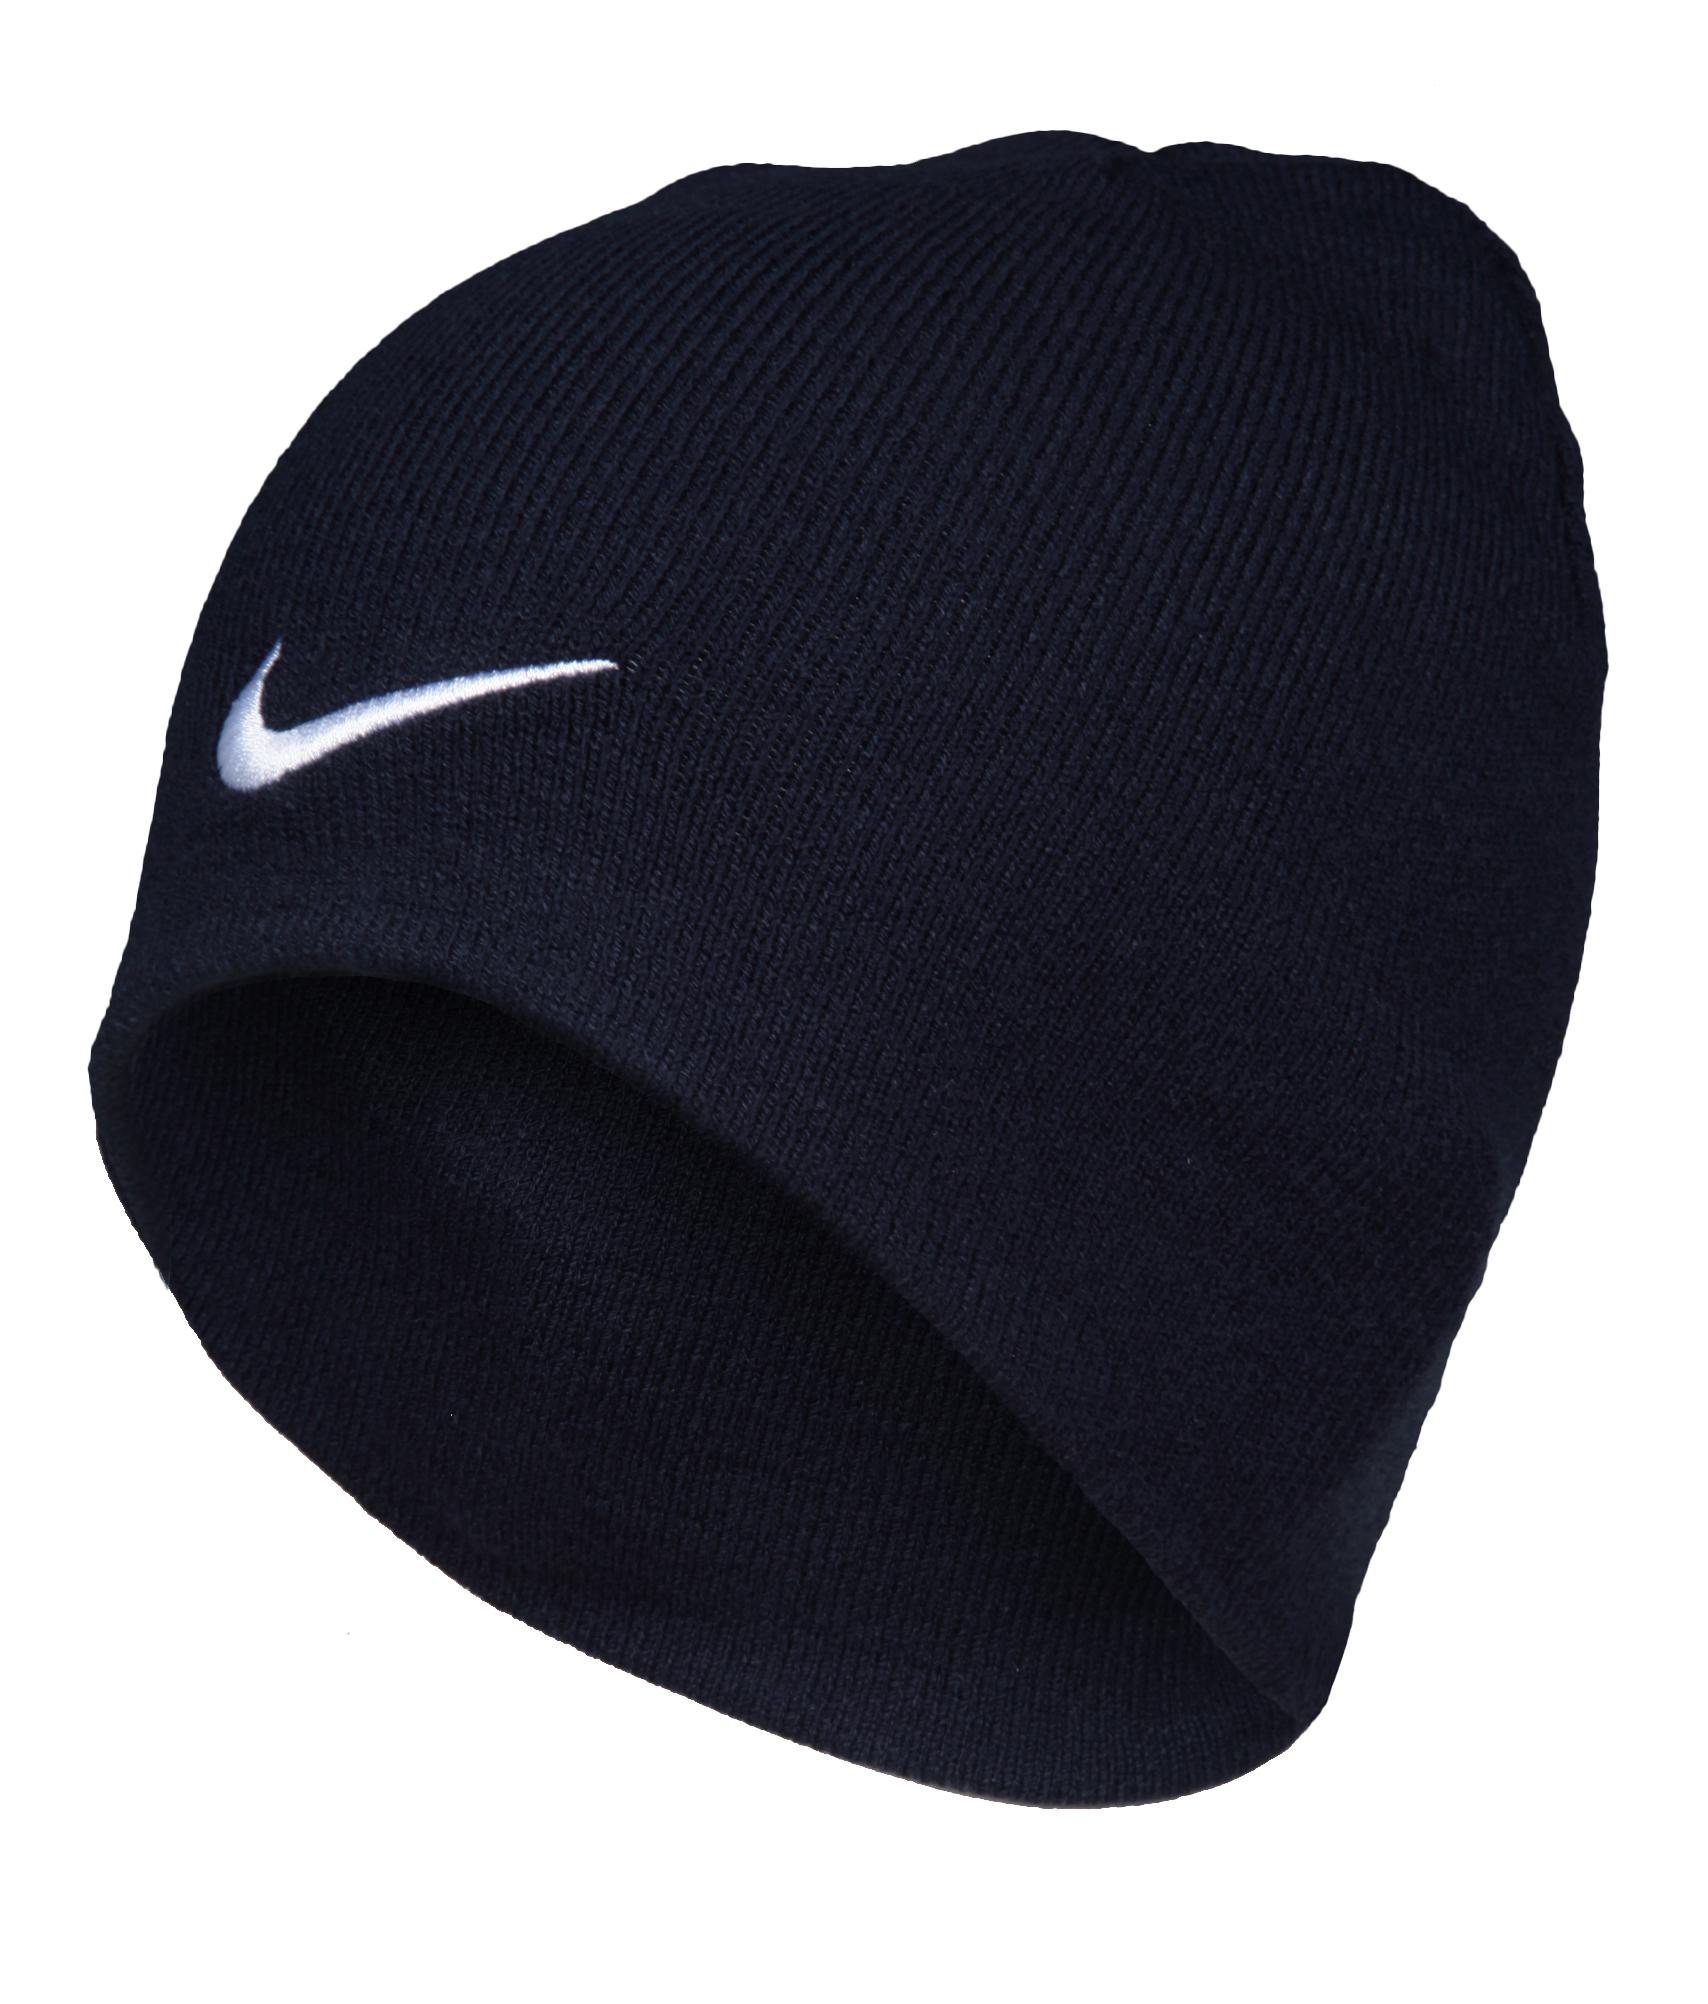 Шапка Nike, Размер-1SIZE спортивные лифчики найк